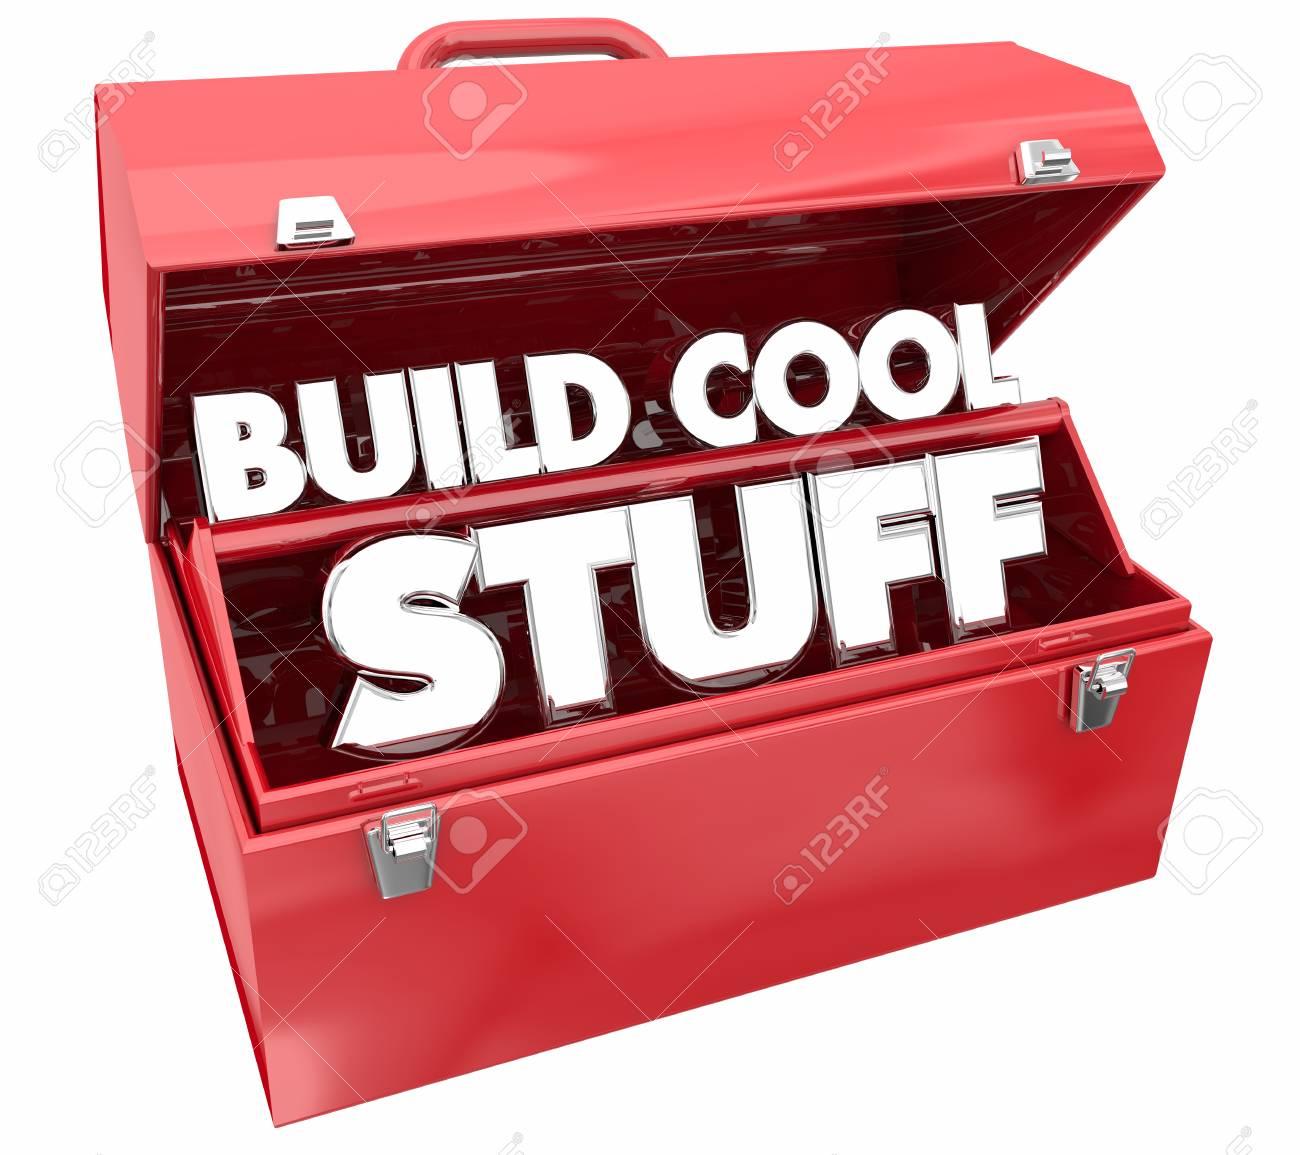 Build Cool Stuff Toolbox Words Make Invent 3d Illustration Stock ...